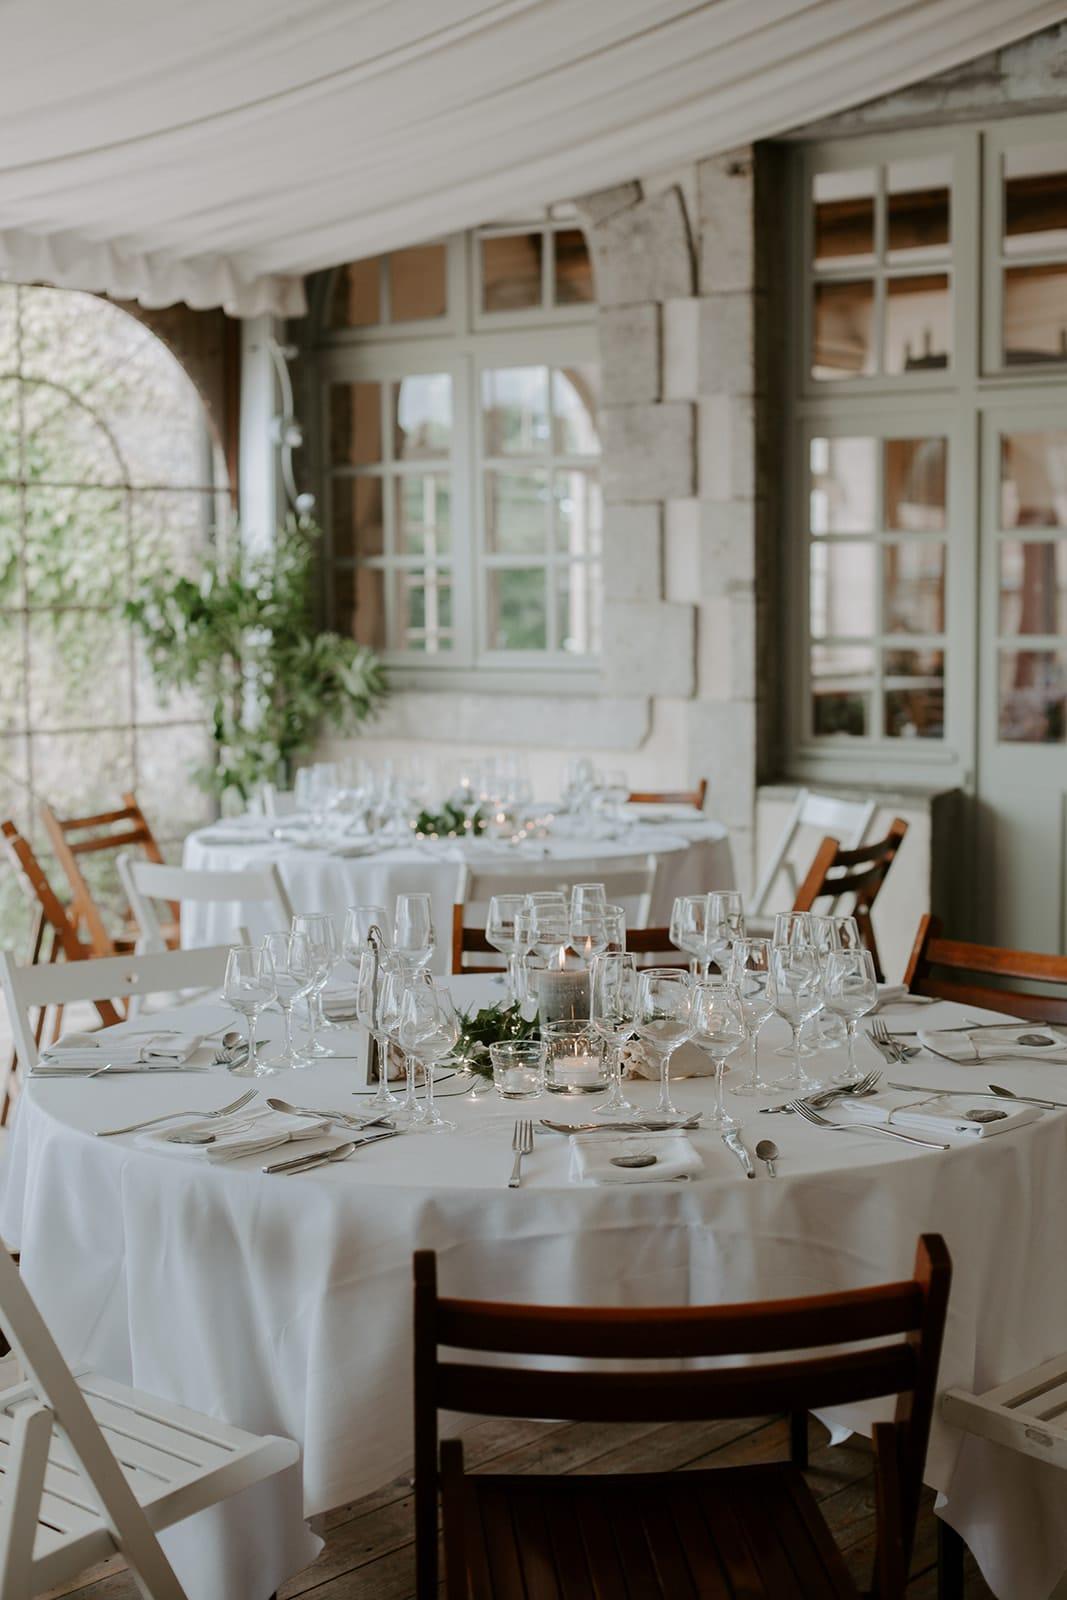 mariage_chateau_la_flocelliere_vendee_flavie_nelly_photographe-11-obonheurdesdames-decoration-mariage-location-vegetal